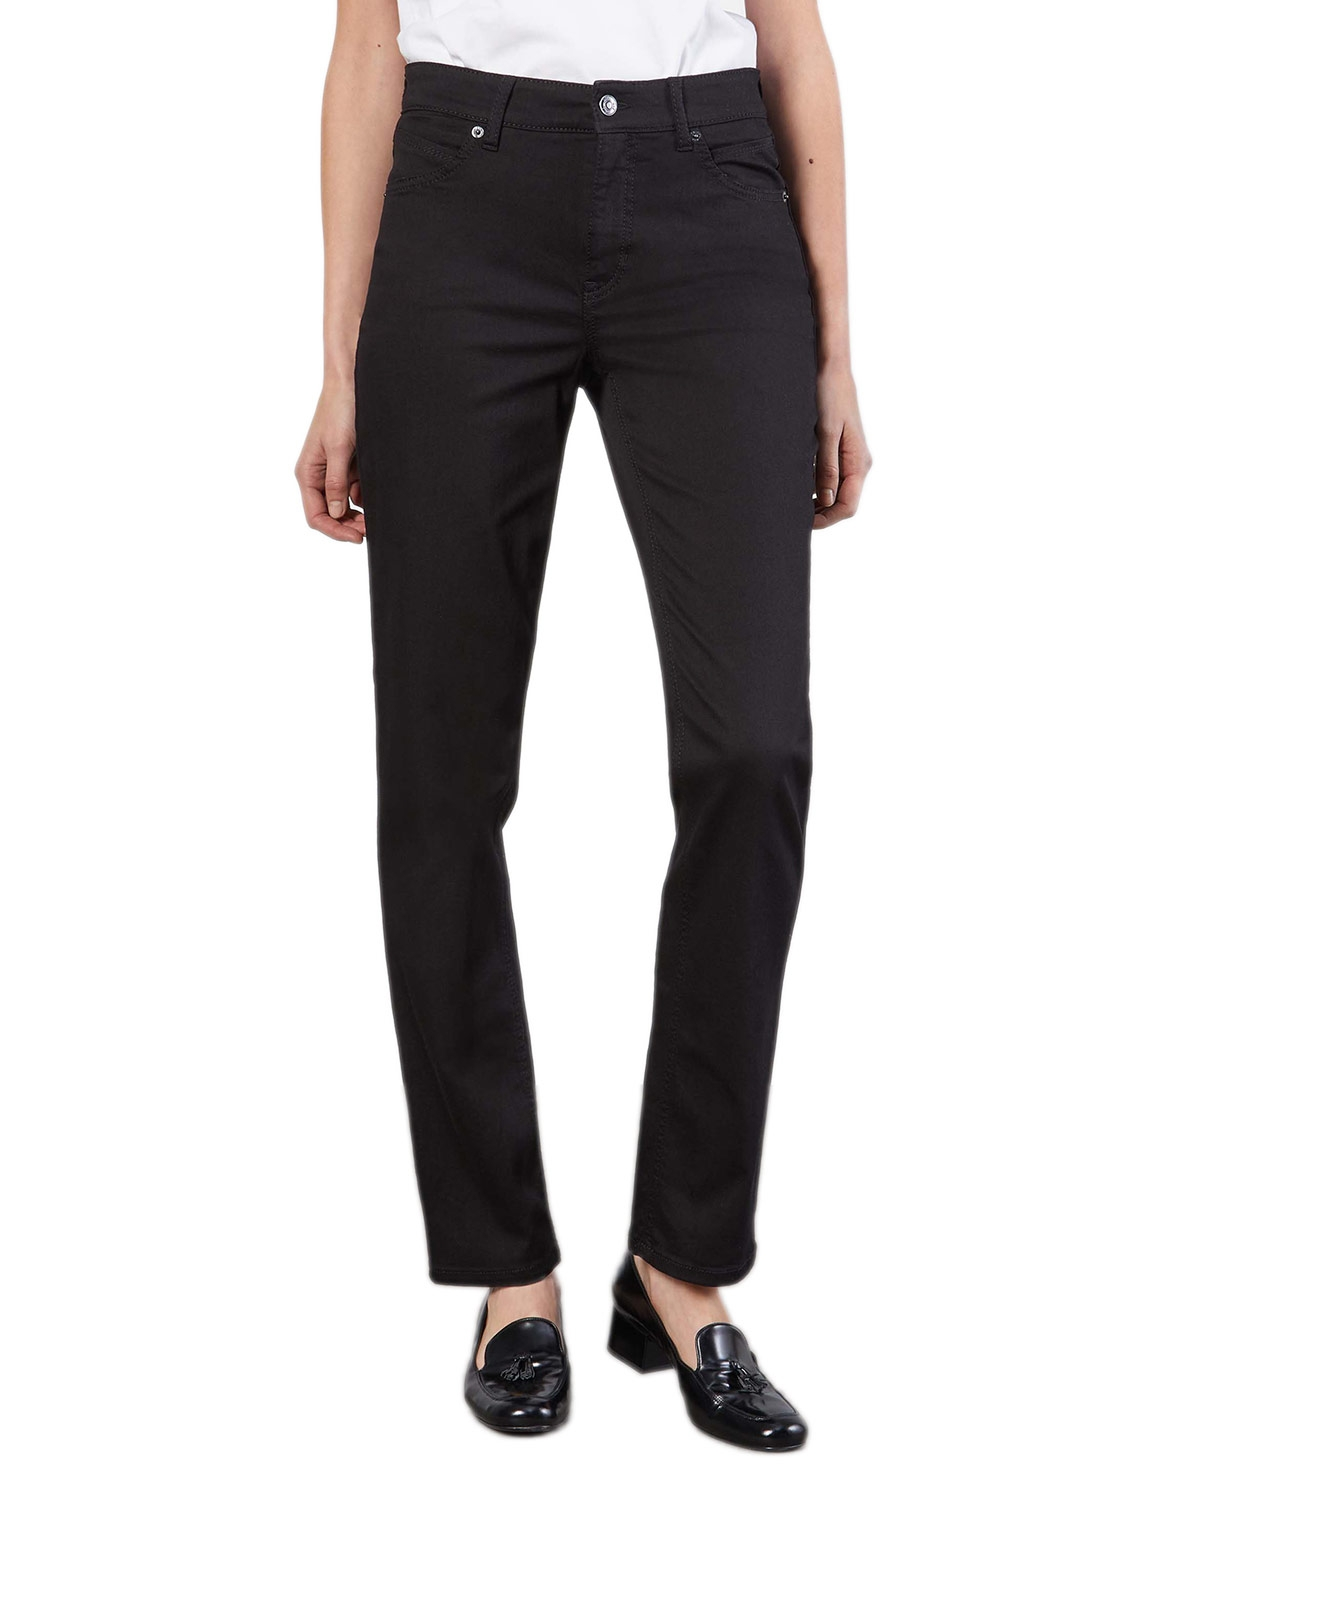 Hosen - MAC Straight Leg Jeans Melanie in Black Black  - Onlineshop Jeans Meile